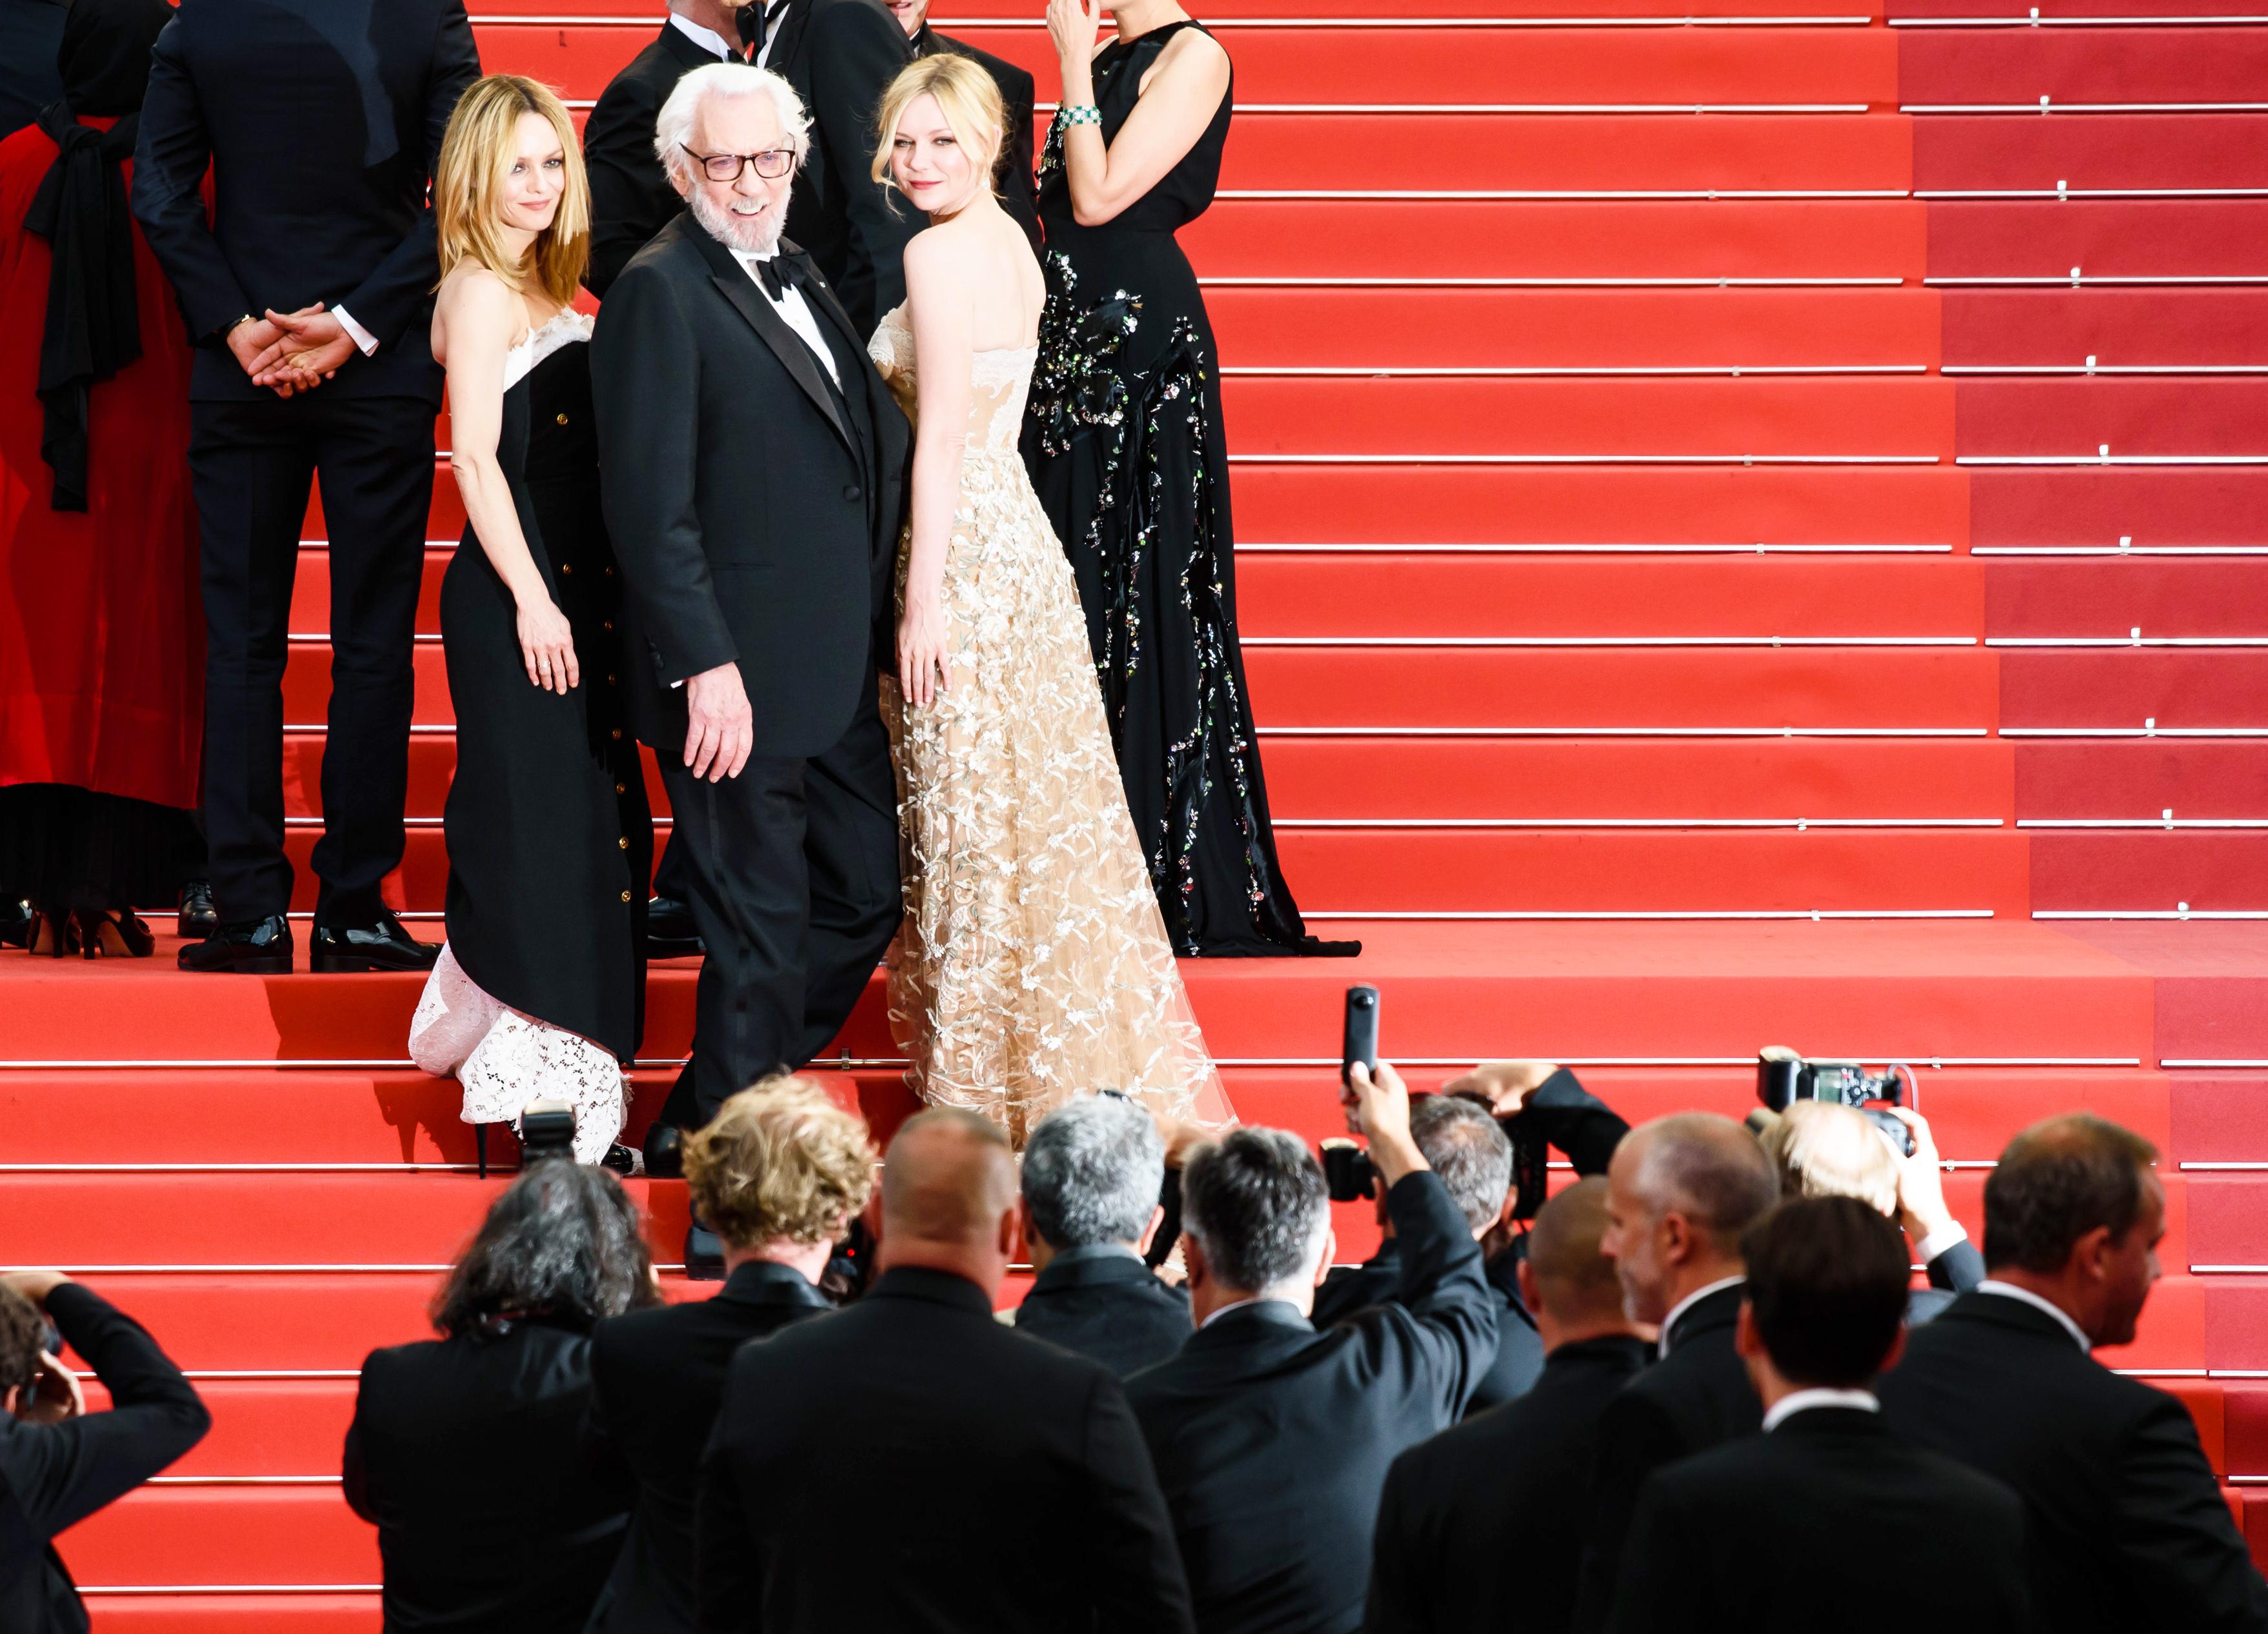 69th annual Cannes Film Festival